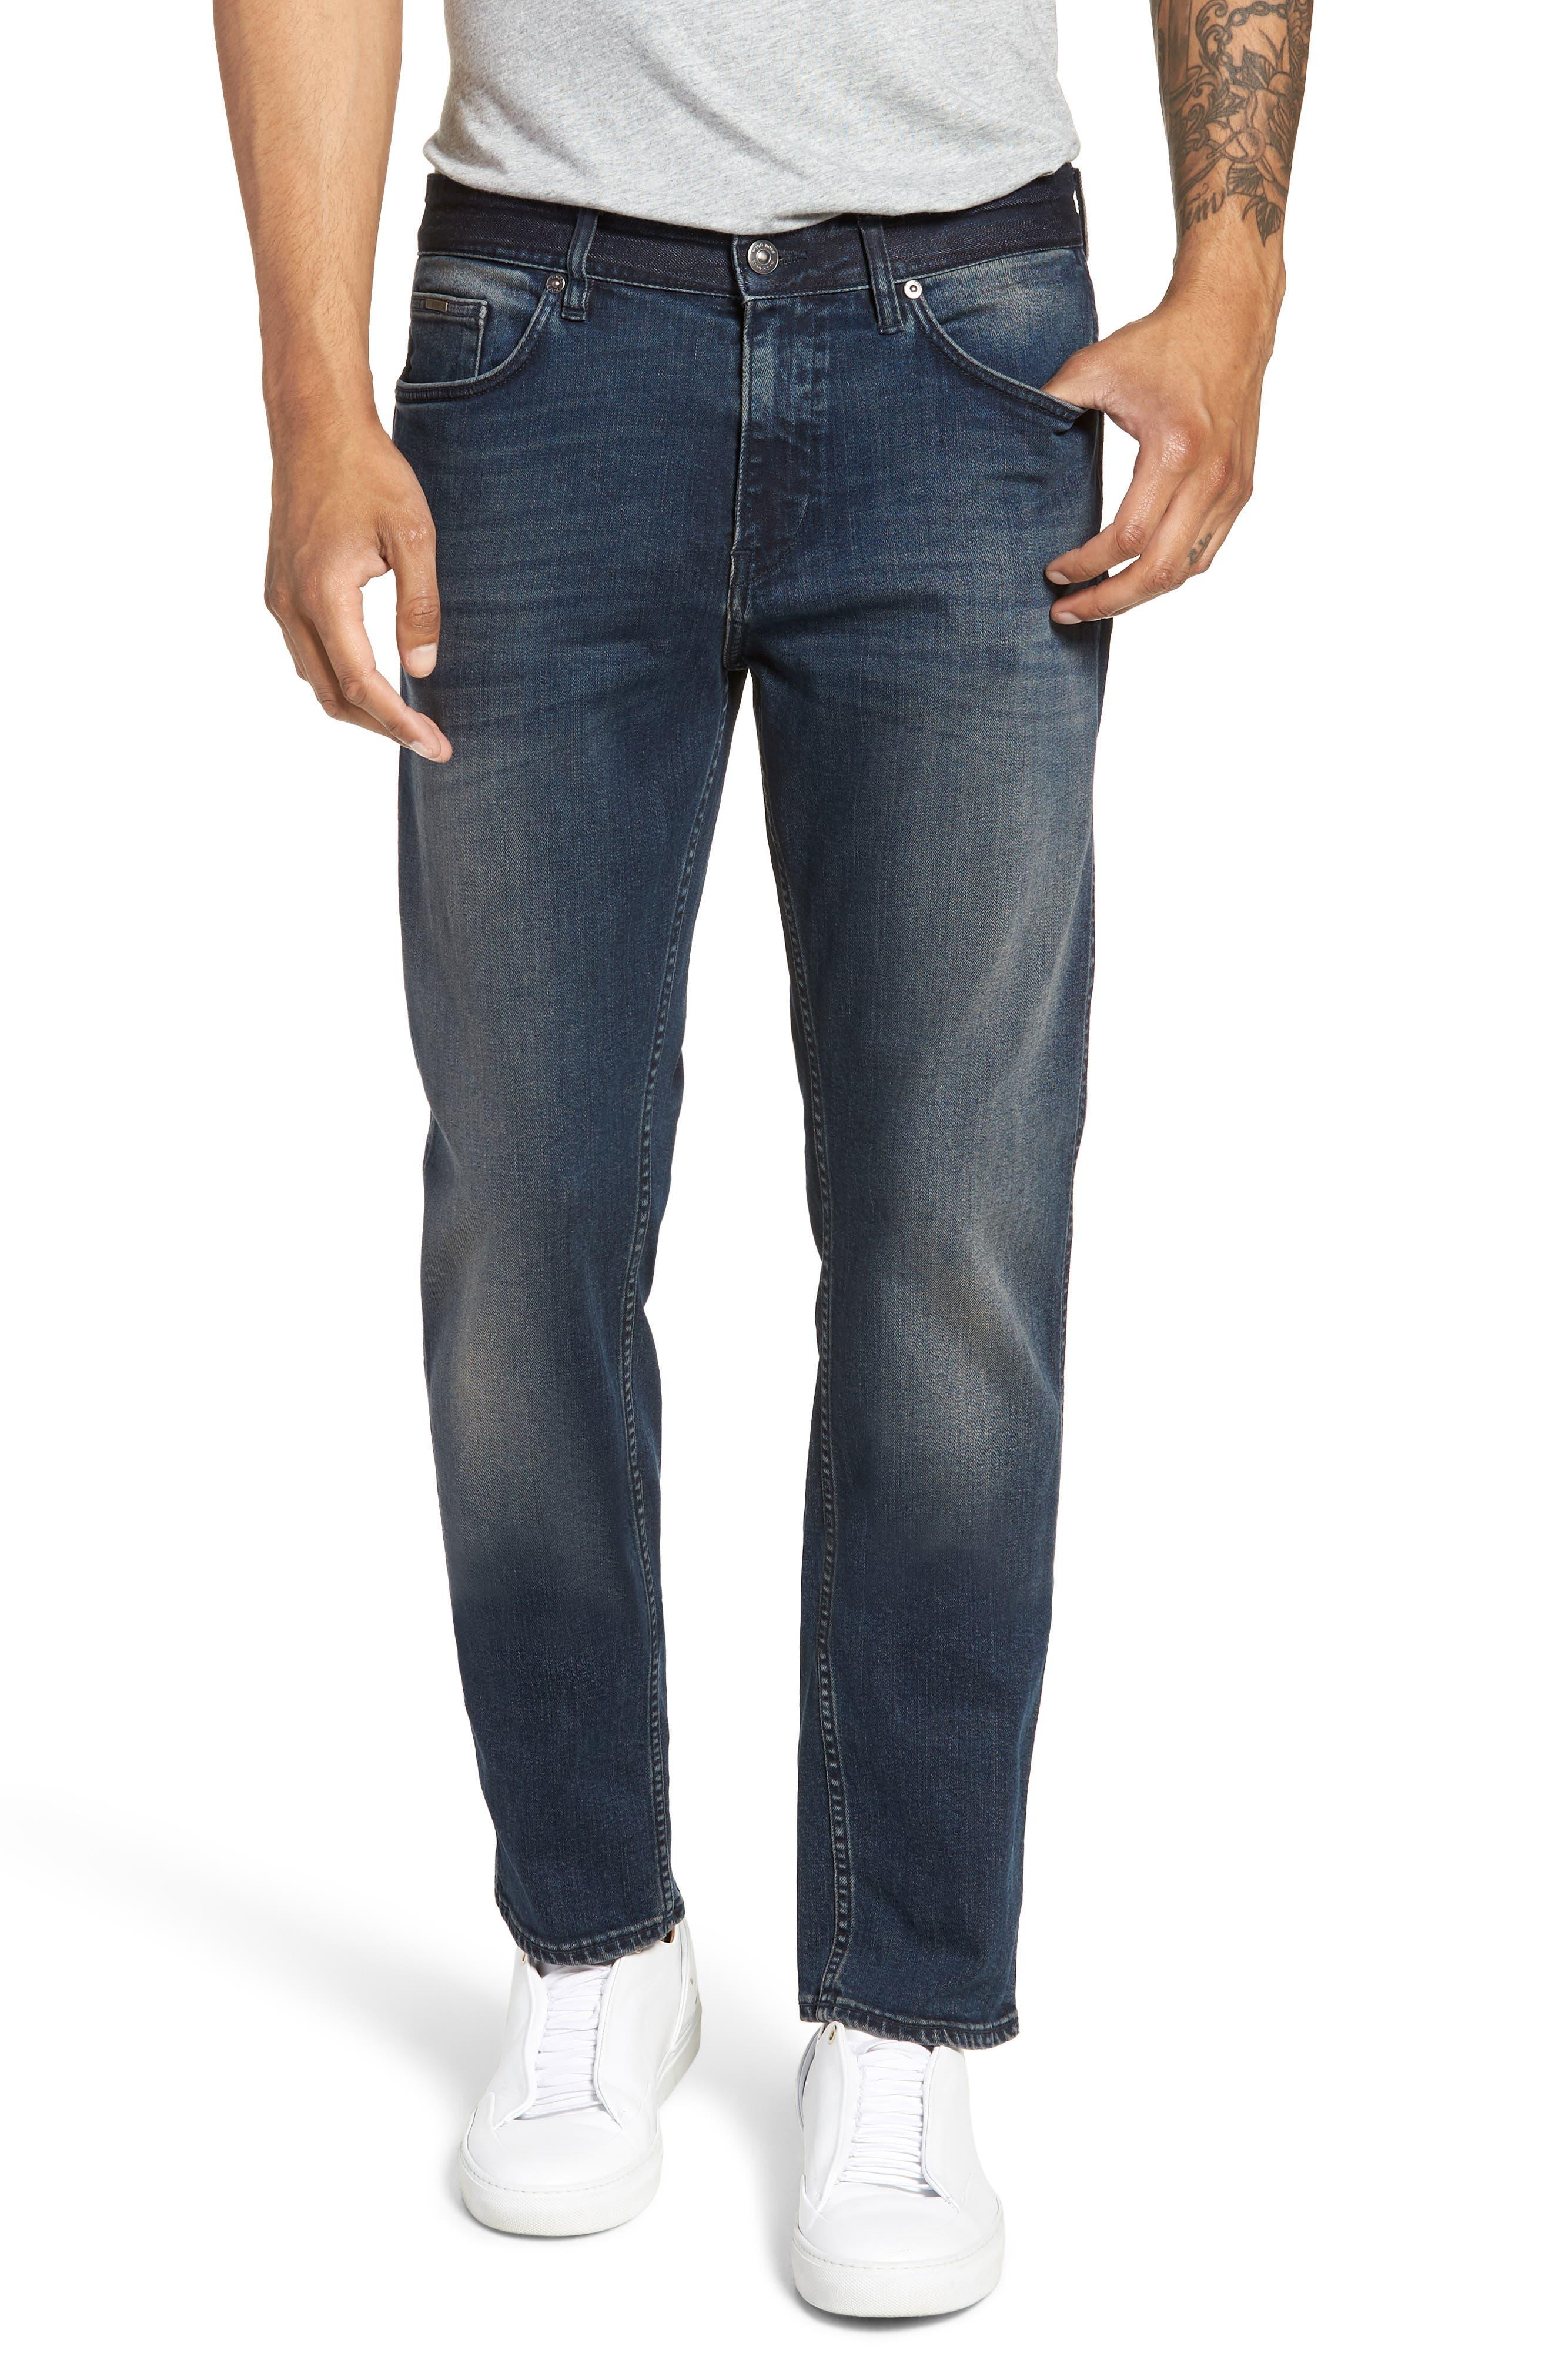 Delaware Slim Fit Jeans,                         Main,                         color, 418